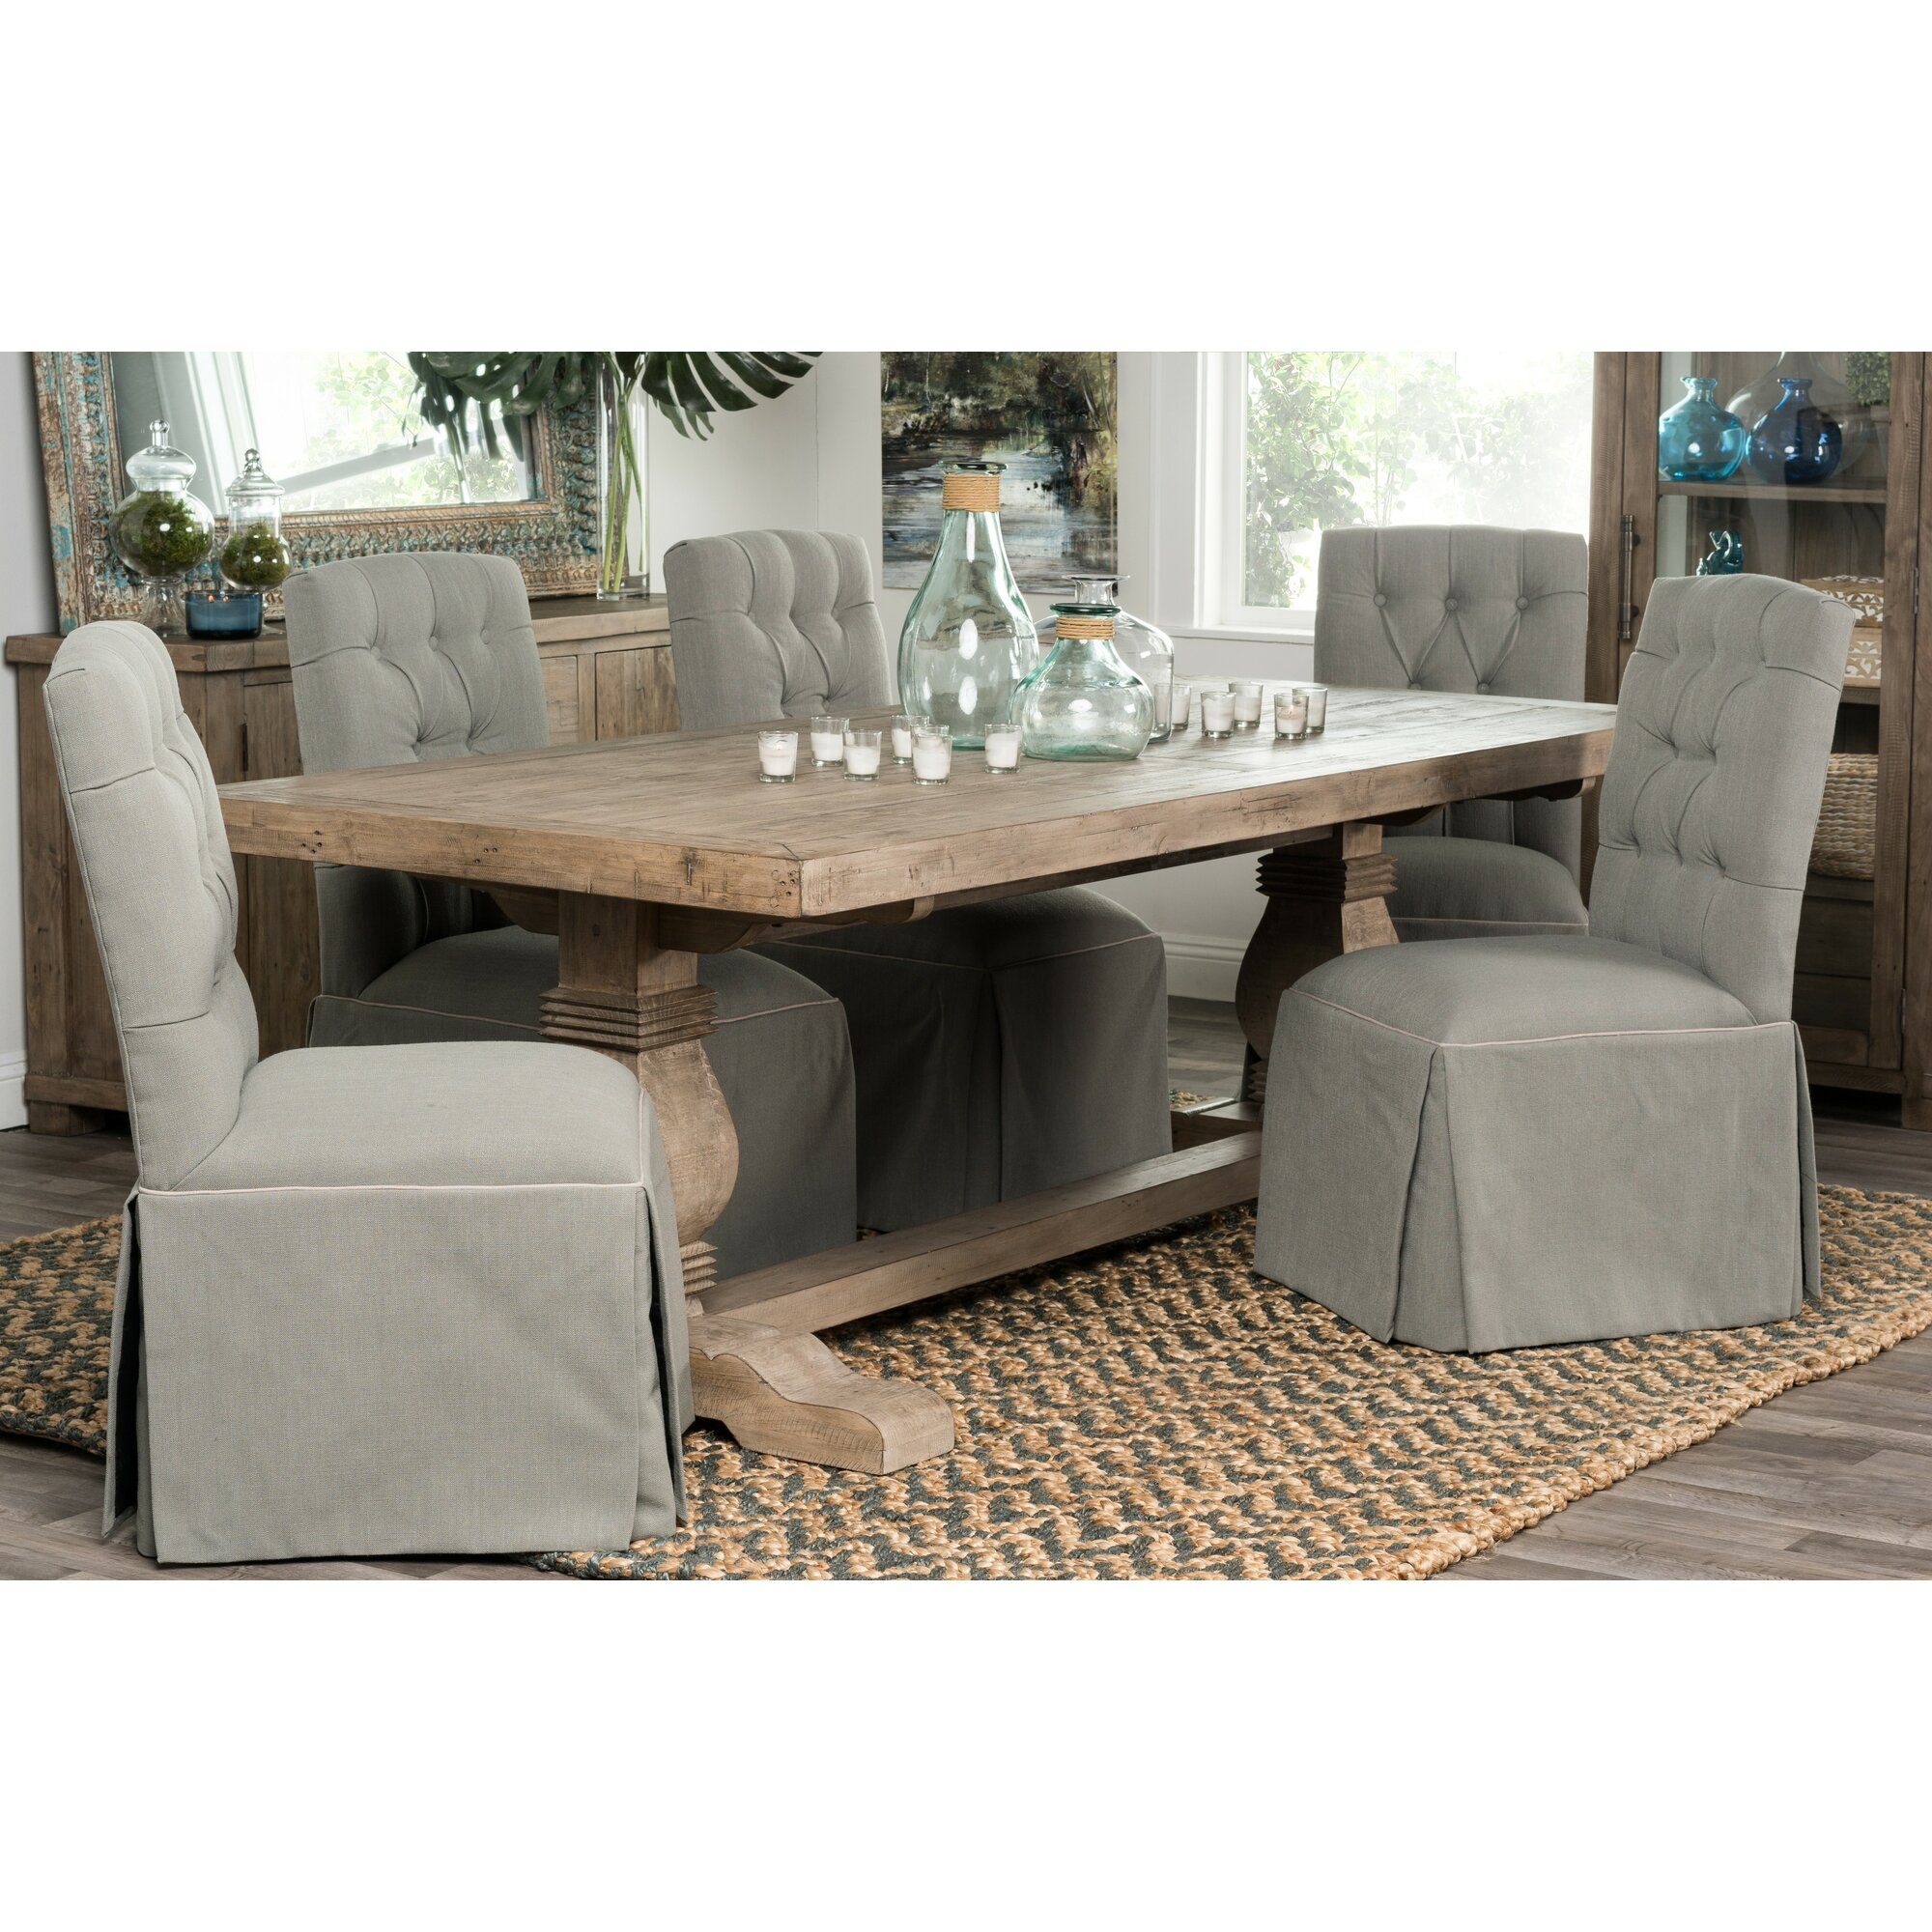 Southwick Reclaimed Wood Dining Table & Reviews | Joss & Main